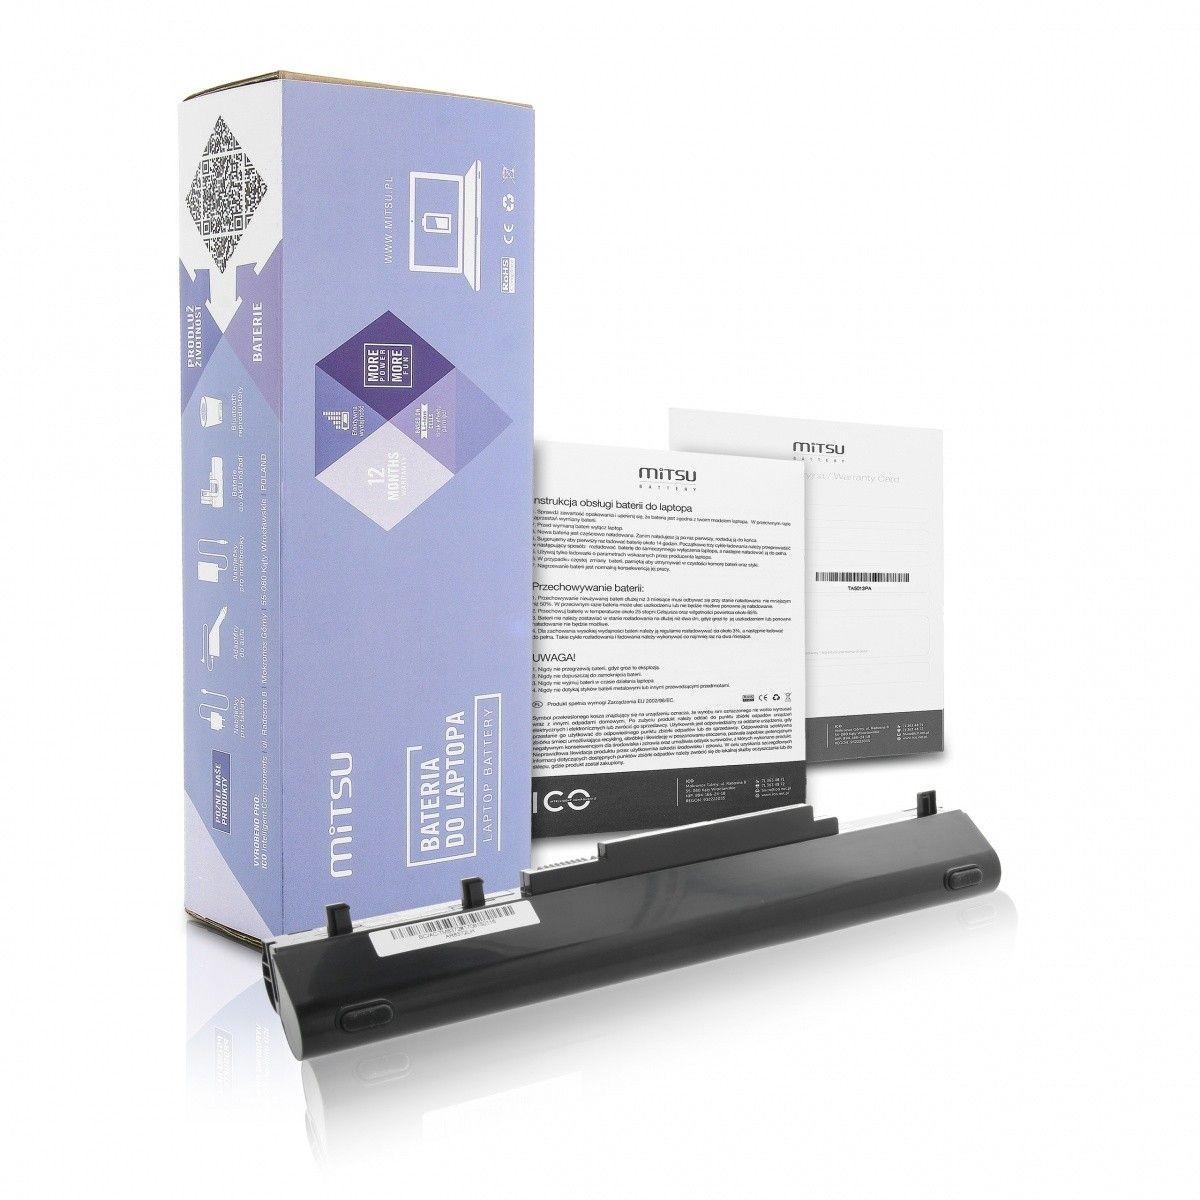 Mitsu Bateria do Acer TM8372,8481G 4400 mAh (63 Wh) 14.4 Volt - 14.8 Volt